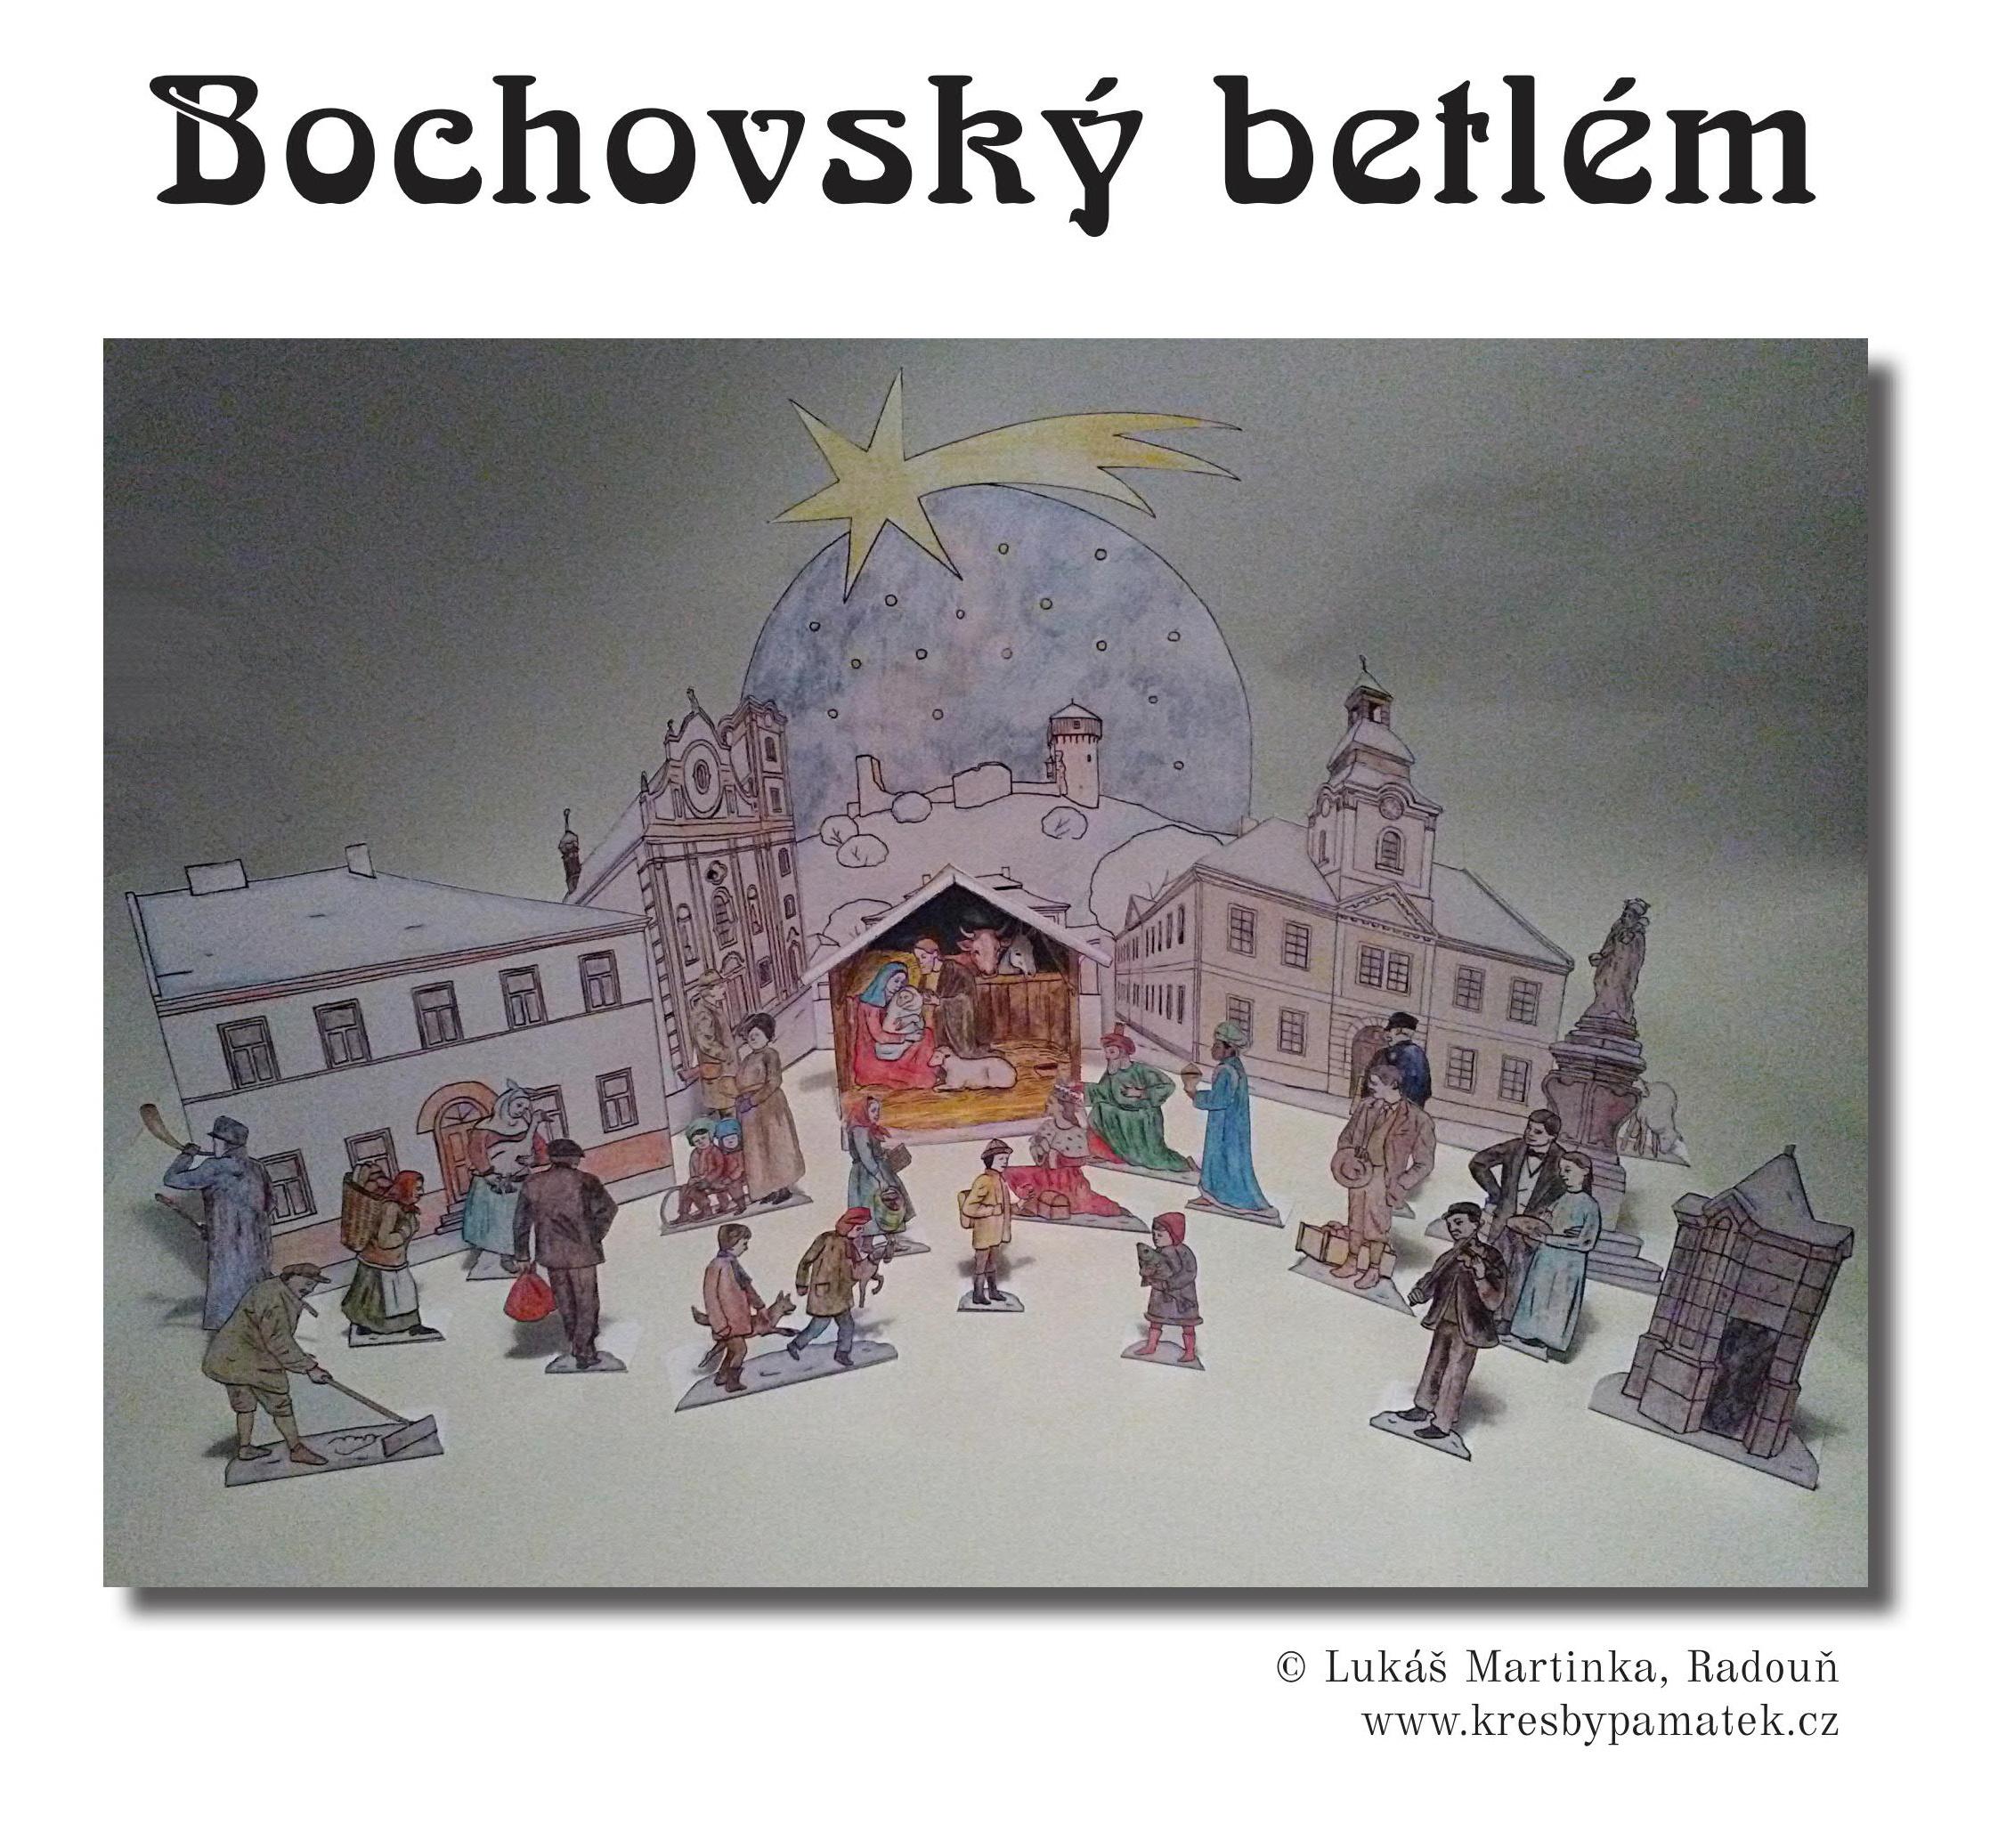 bochovsky betlem